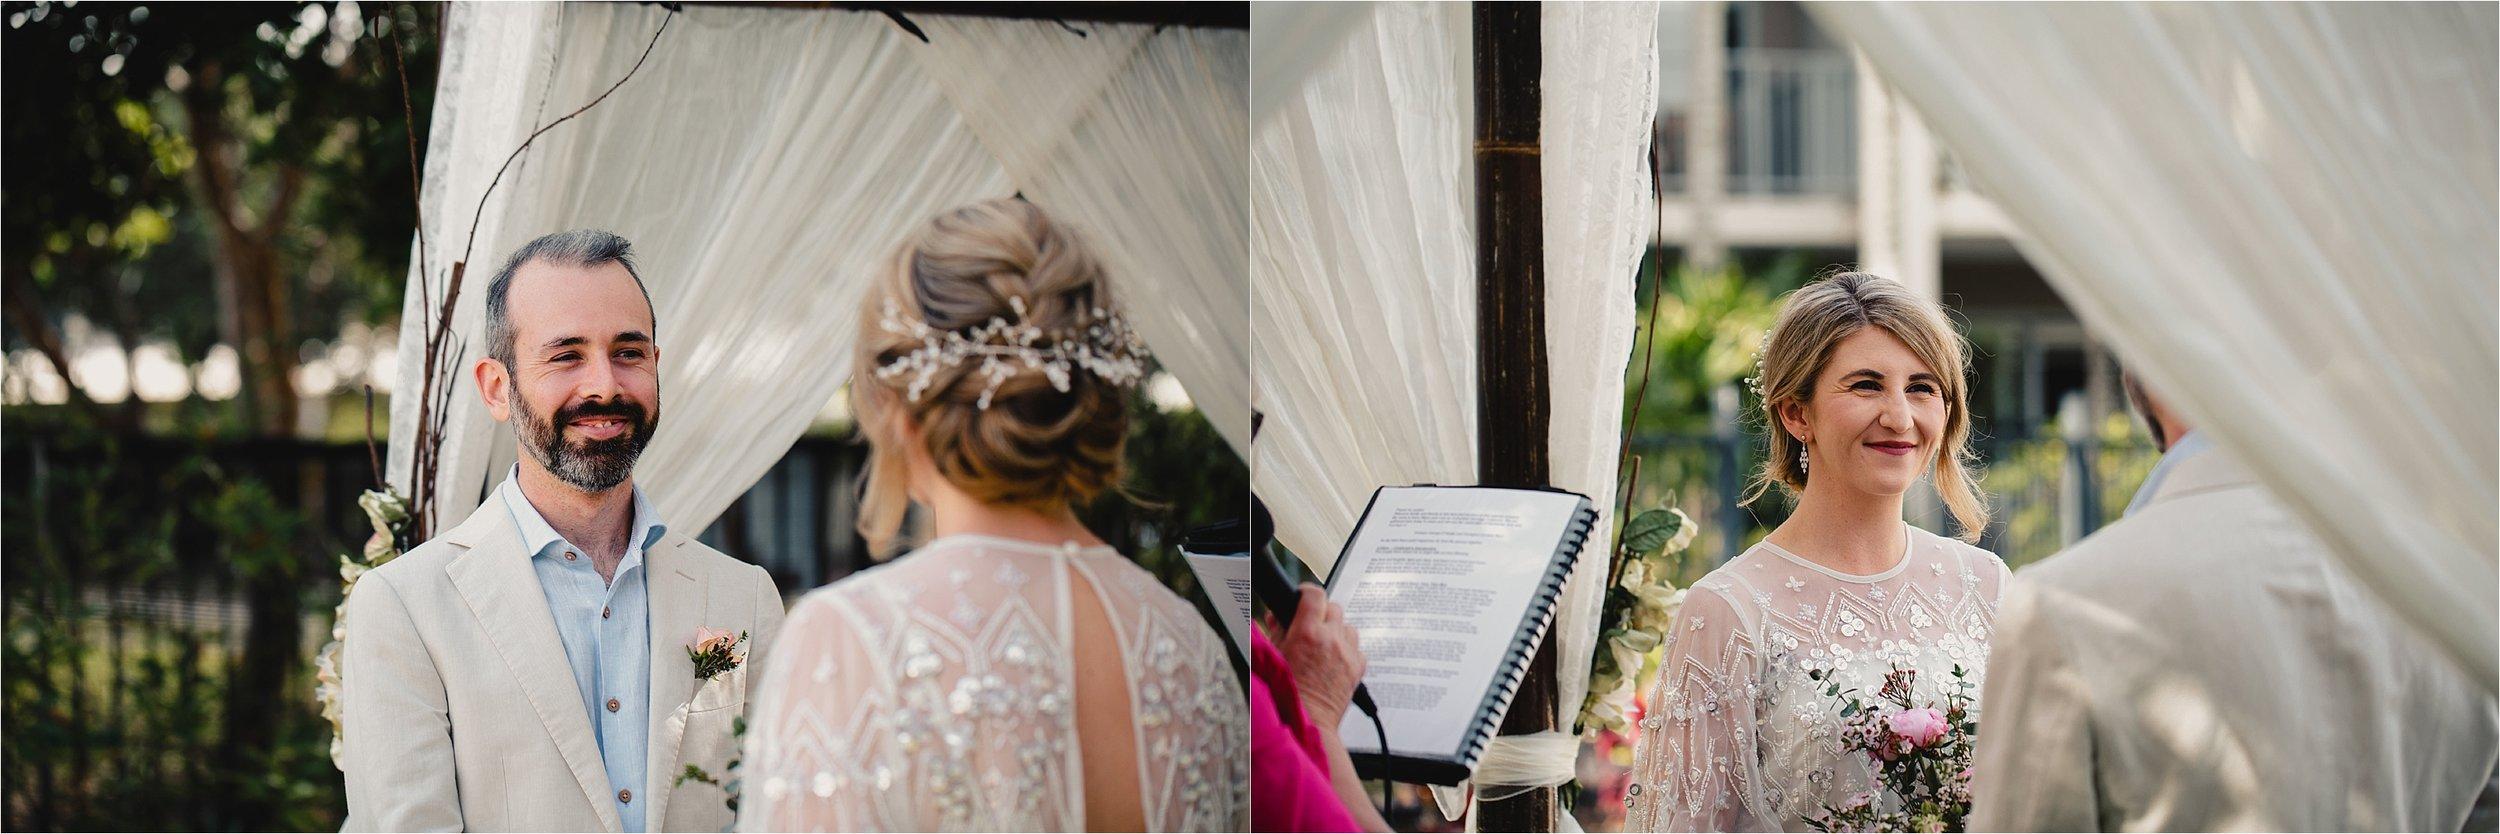 Salt - Wedding - Ceremony - Gold - Coast - Wedding - Photographers_0005.jpg